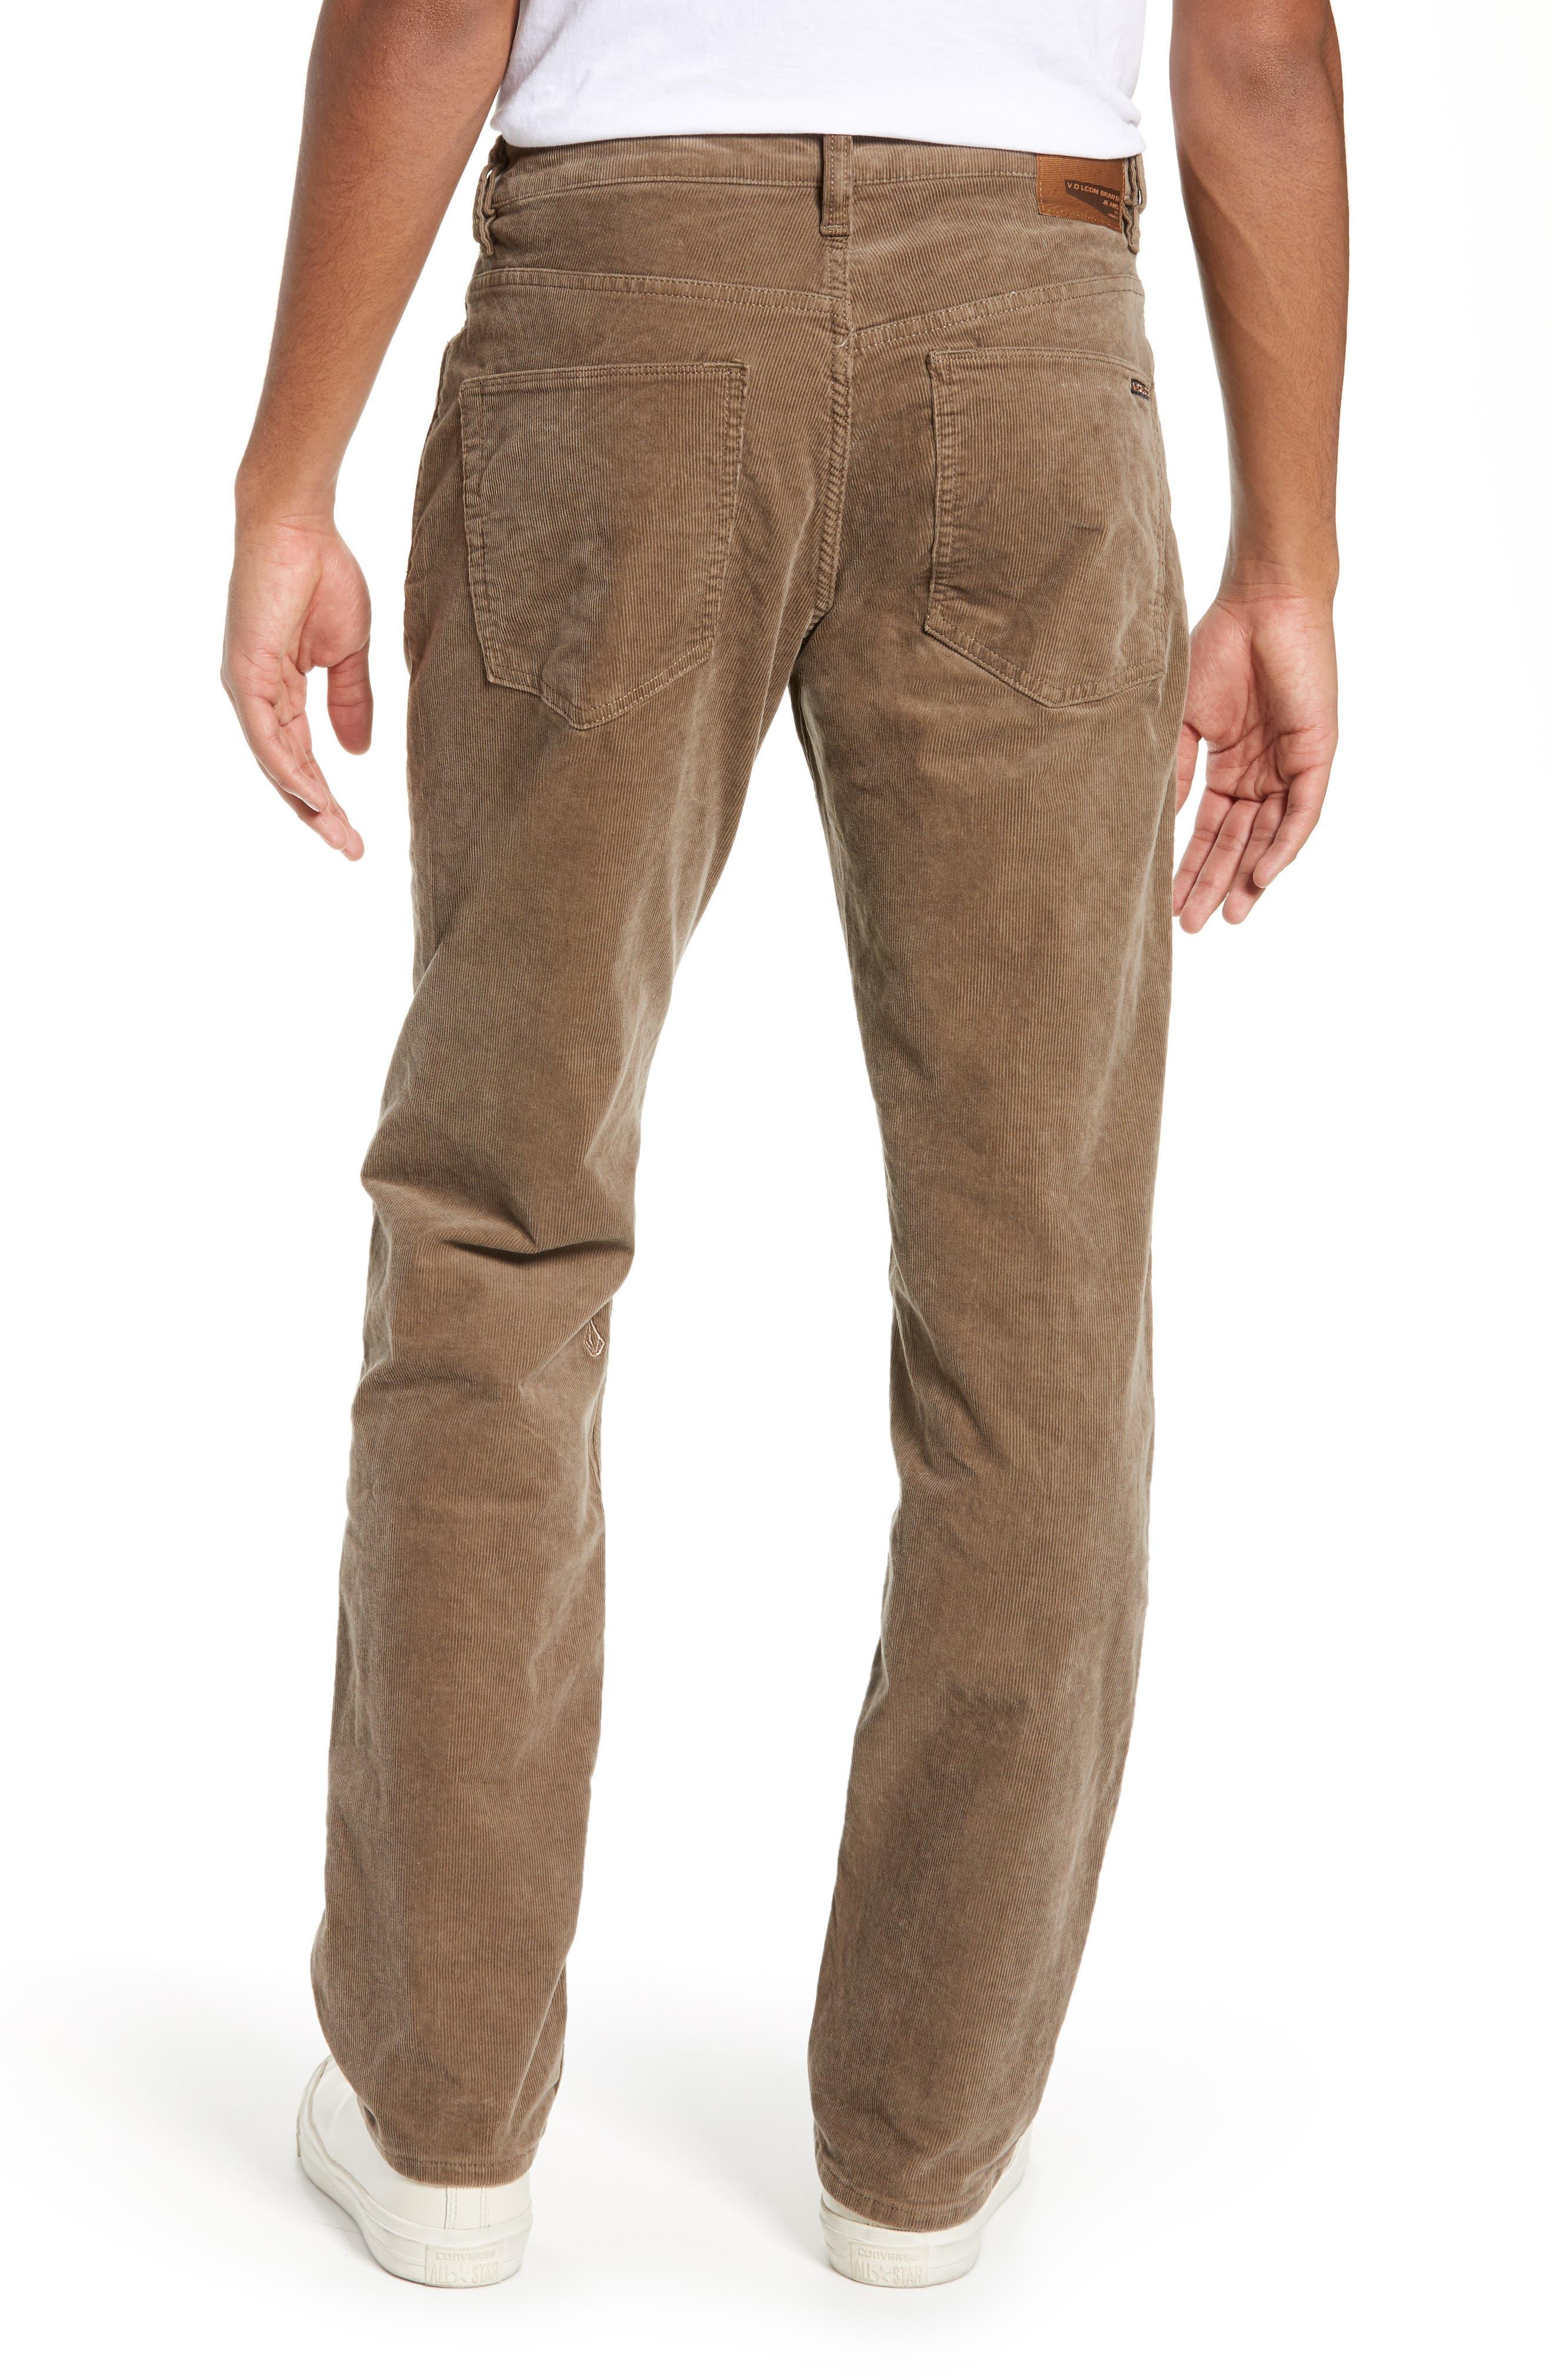 Solver Straight Leg Corduroy Pants,                             Alternate thumbnail 2, color,                             MUSHROOM